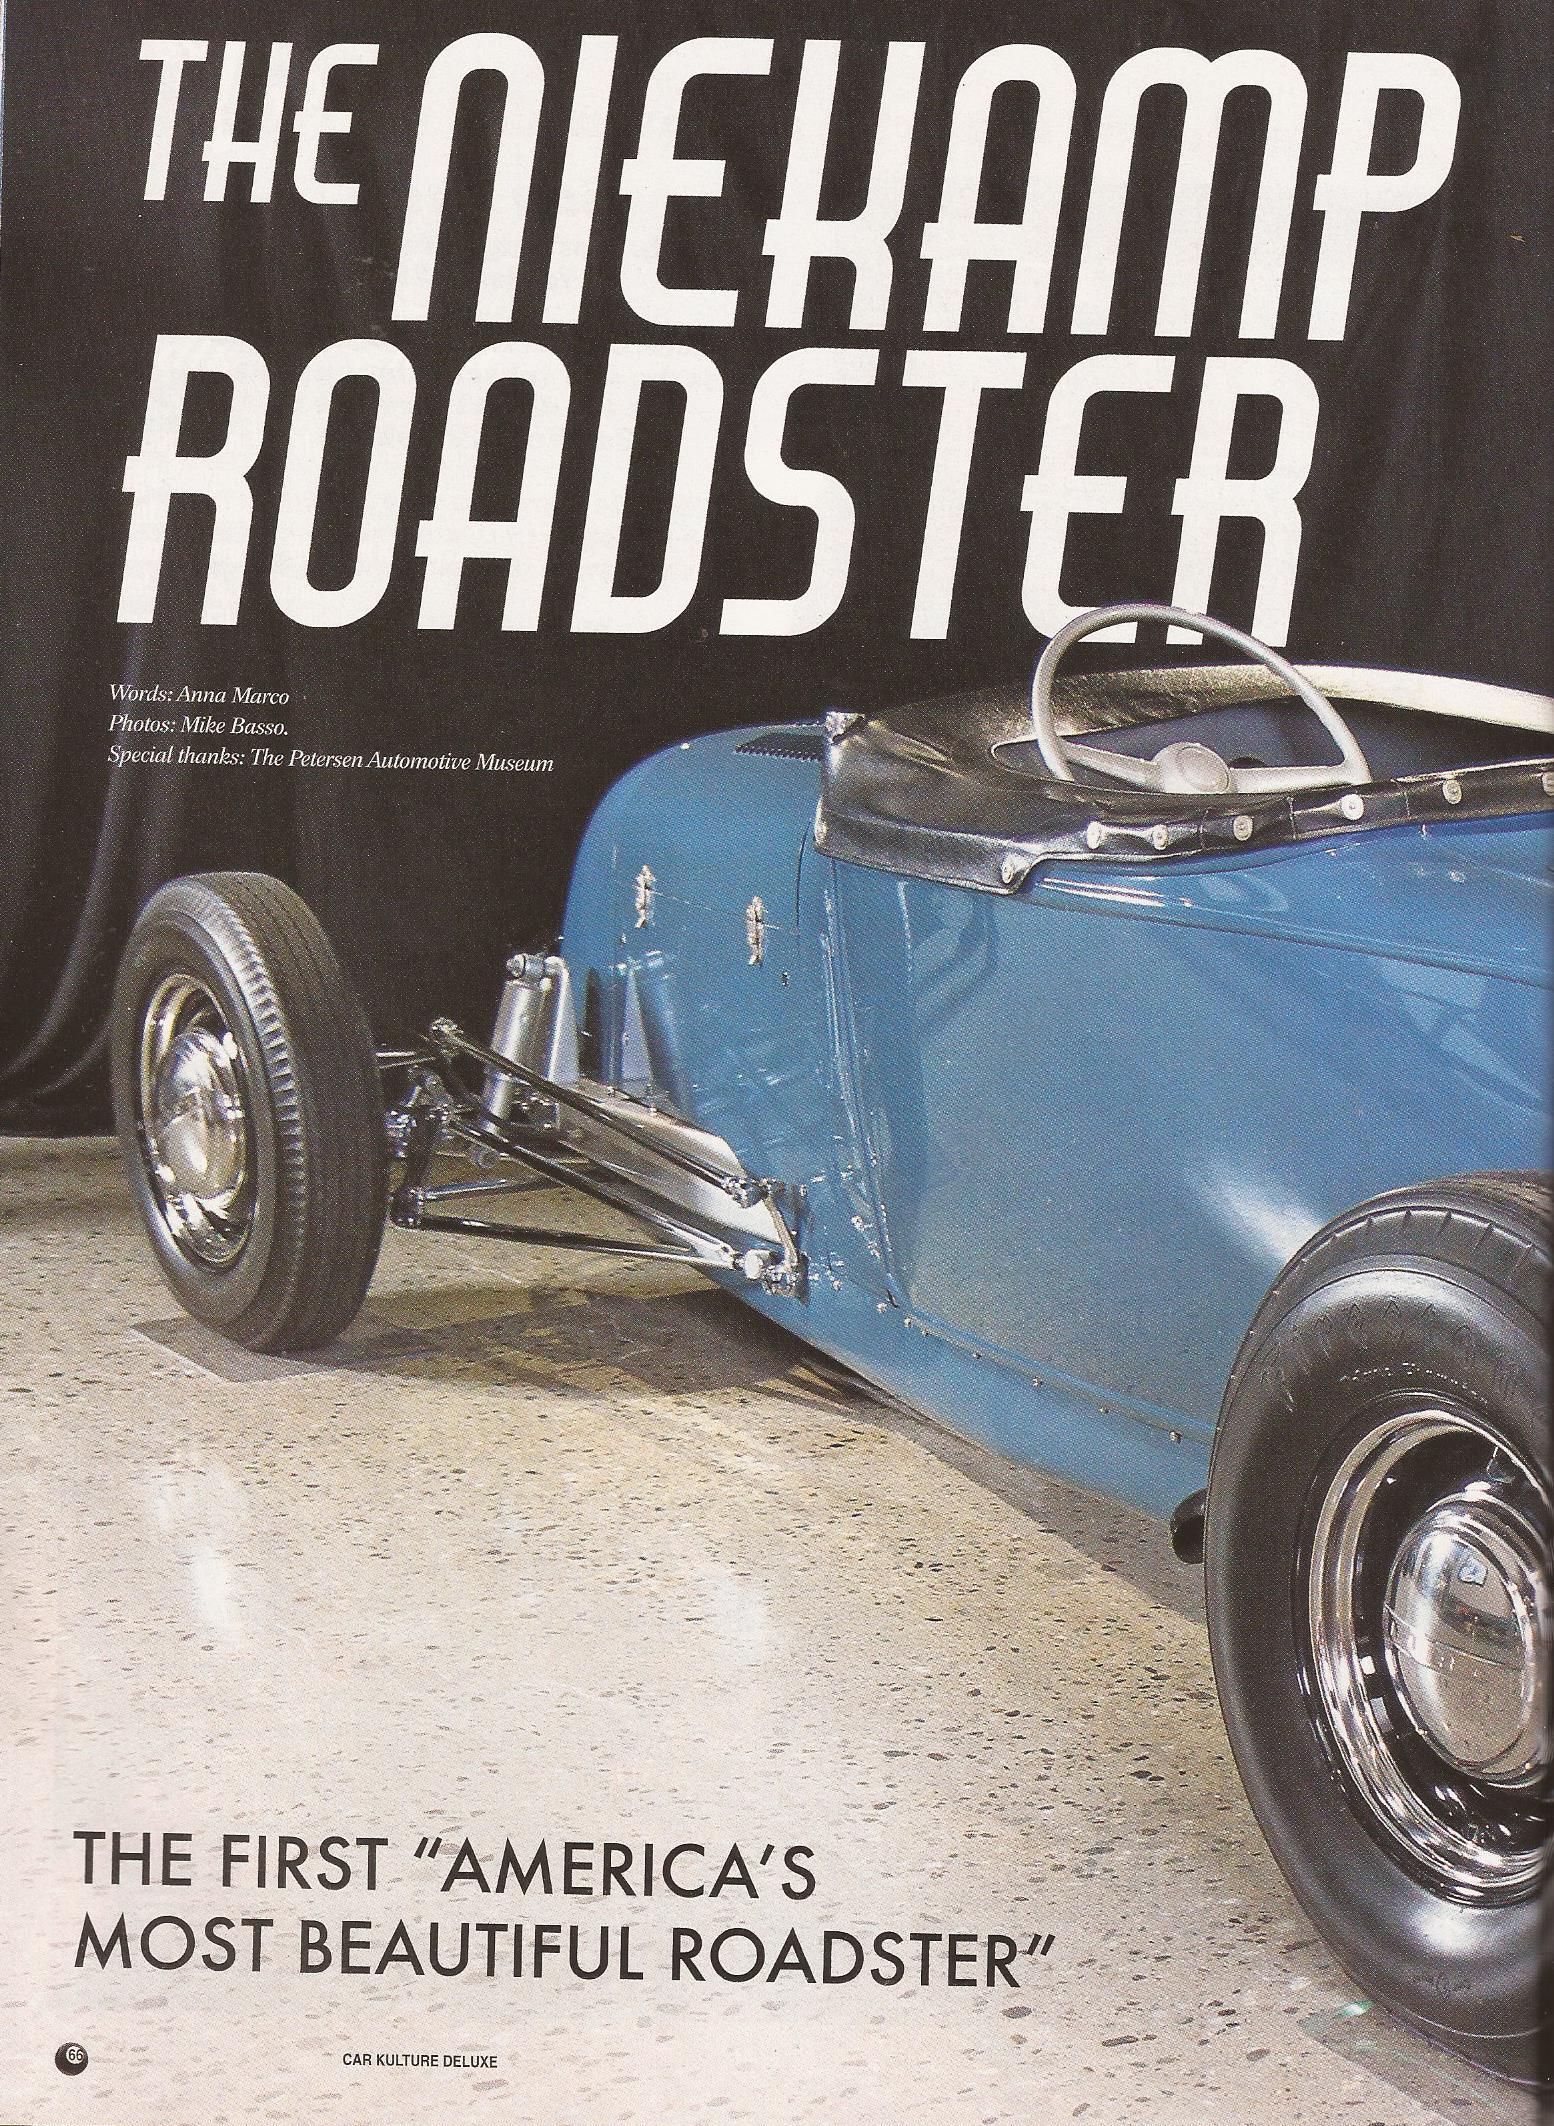 Car Kulture Deluxe Magazine KUSTOM INK